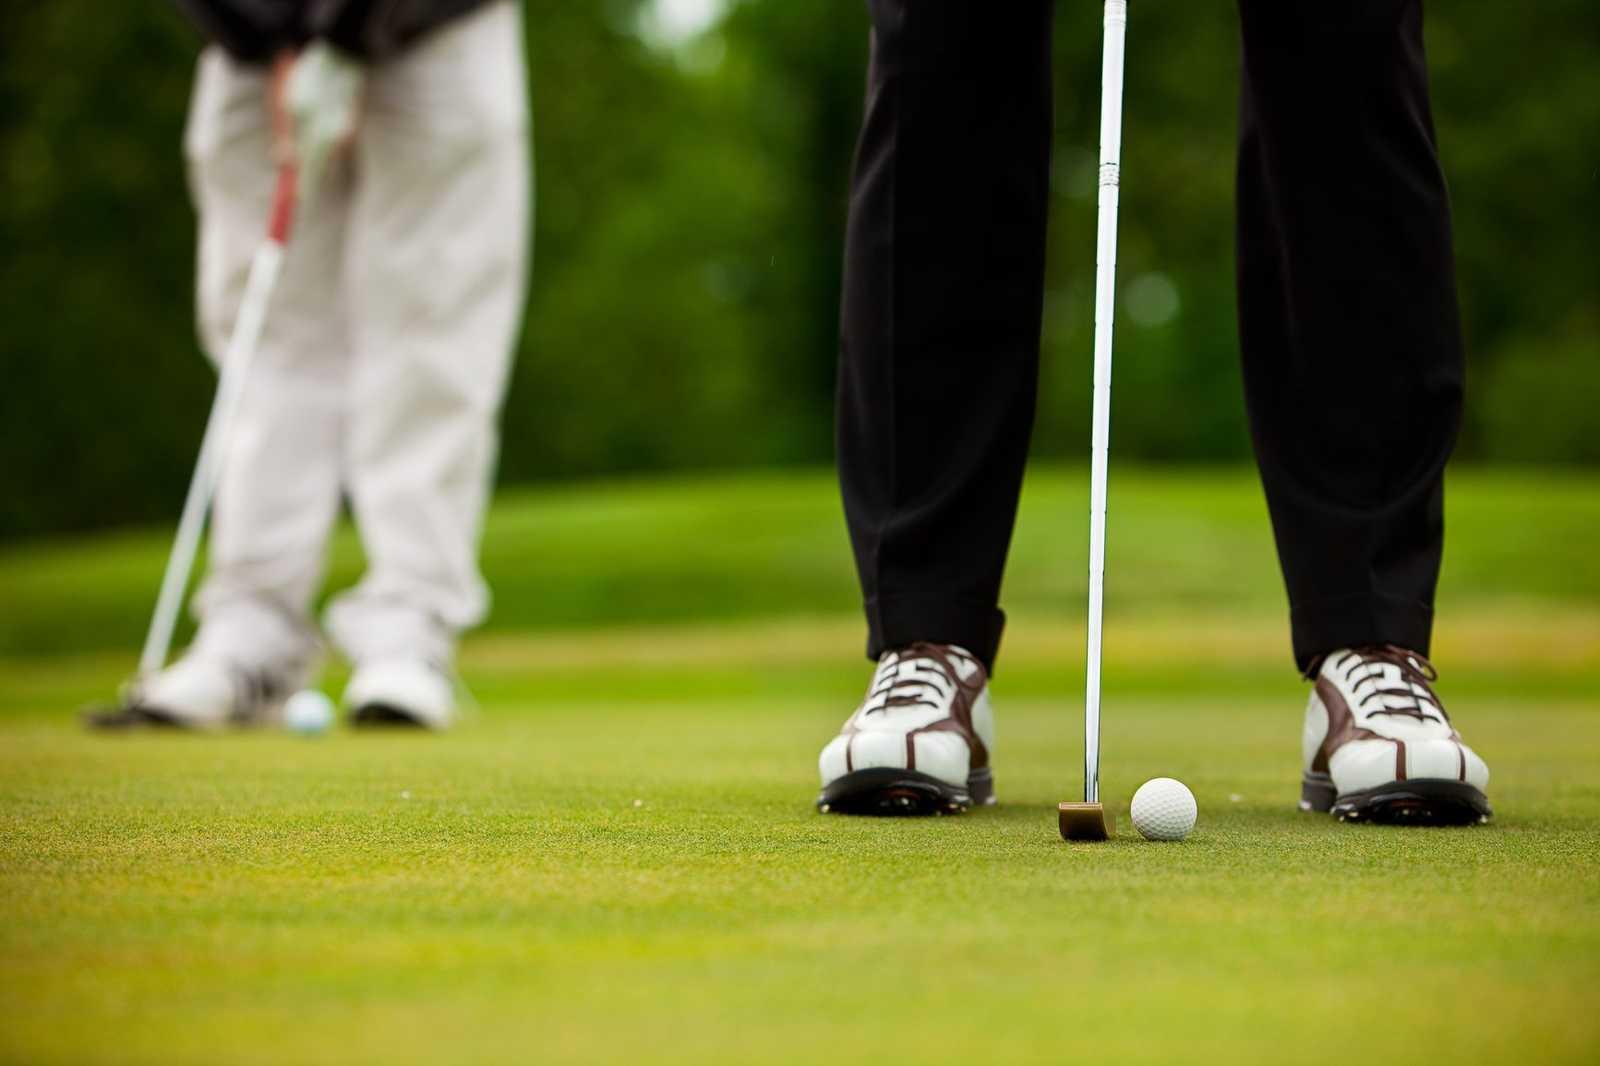 okanagan golf courses - golfer